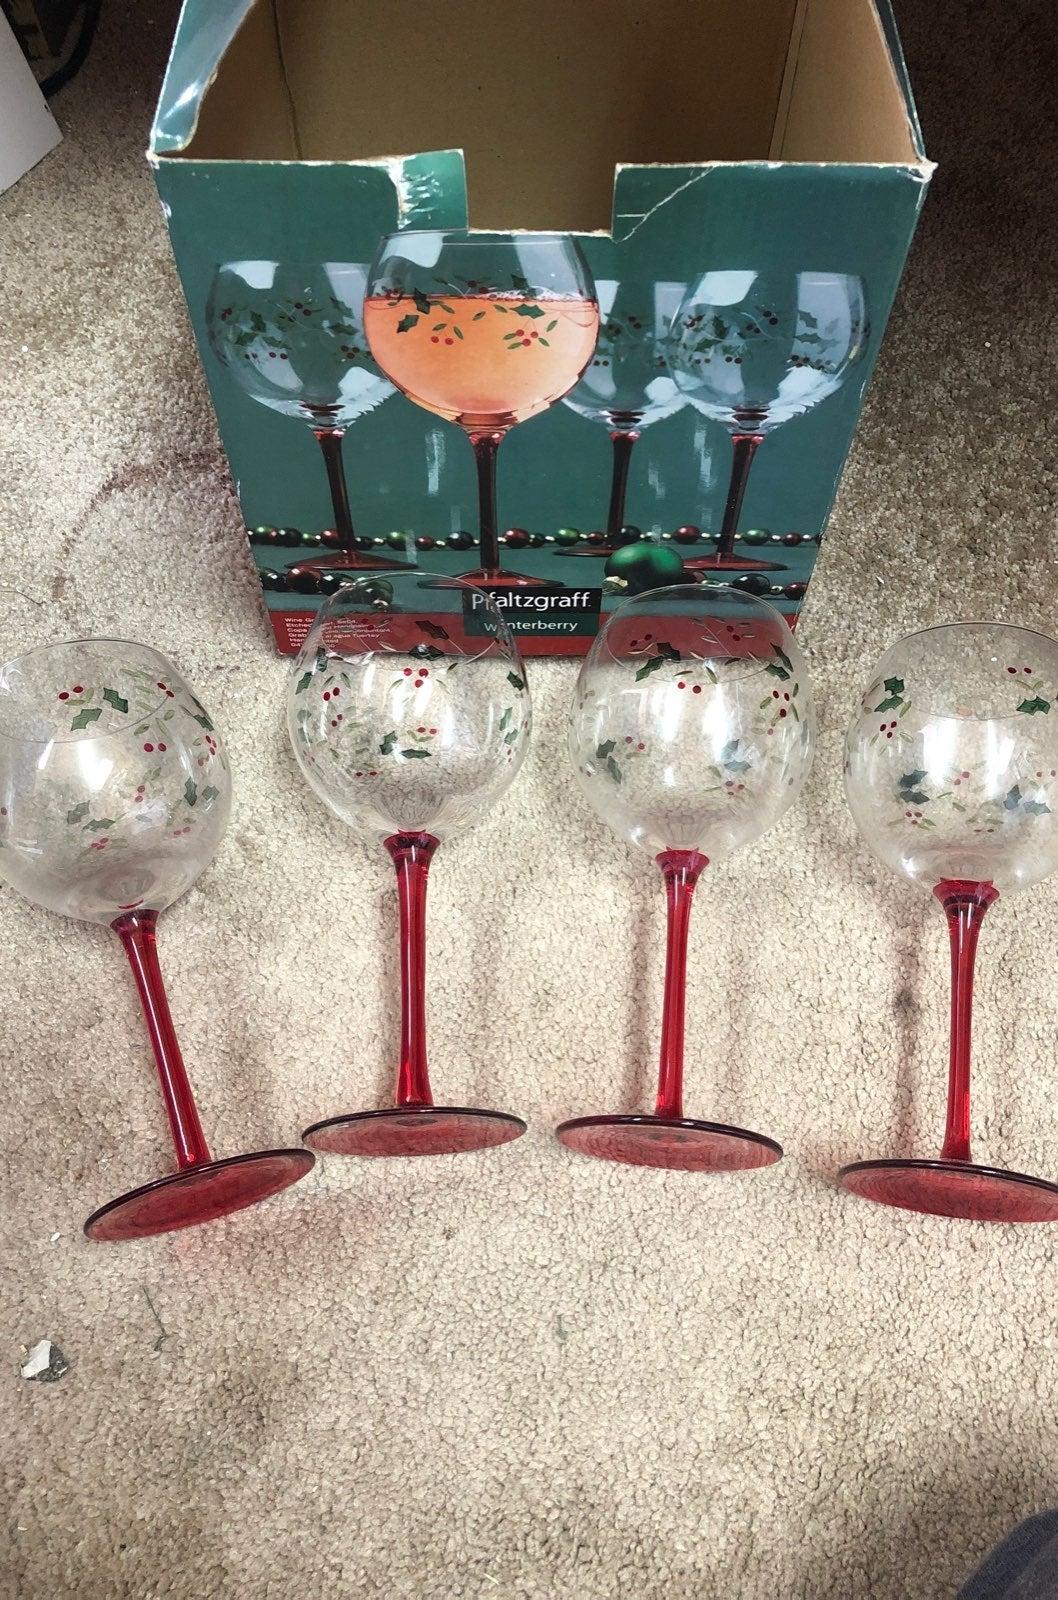 Pfaltzgraff Holiday Wine Glass Set of 4